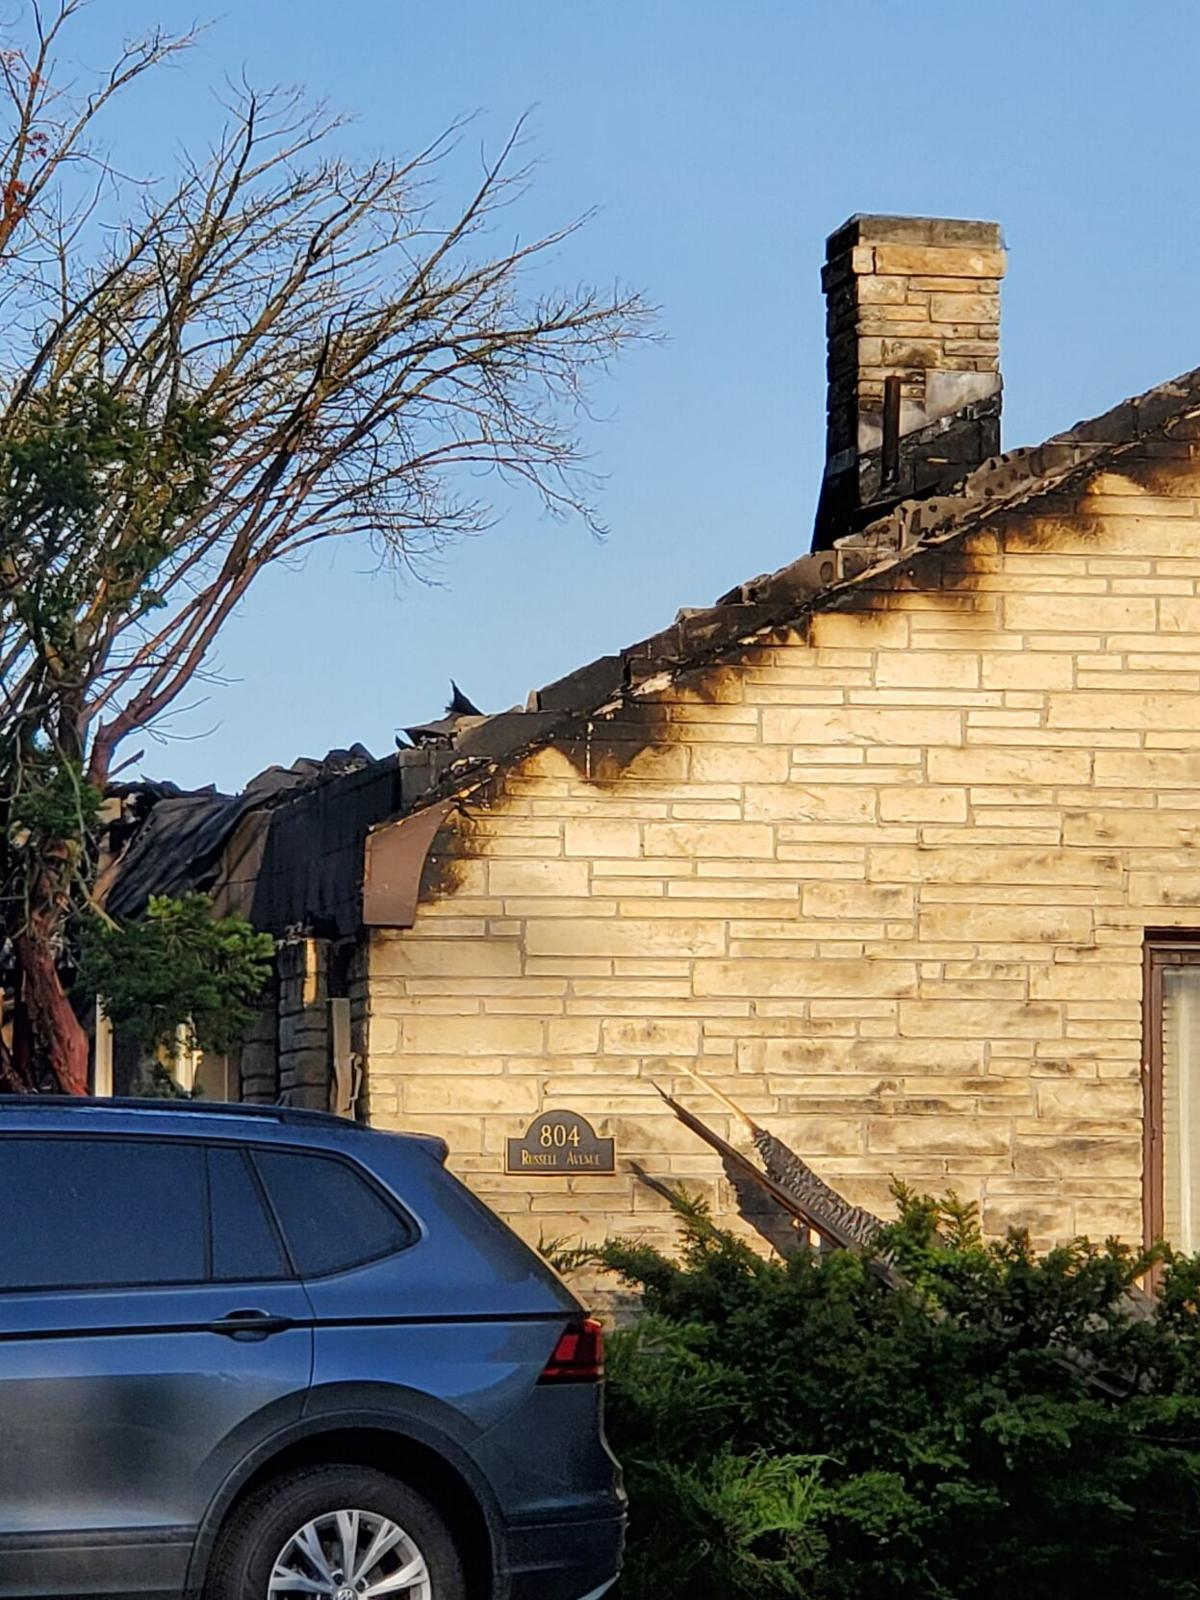 Shenandoah house fire